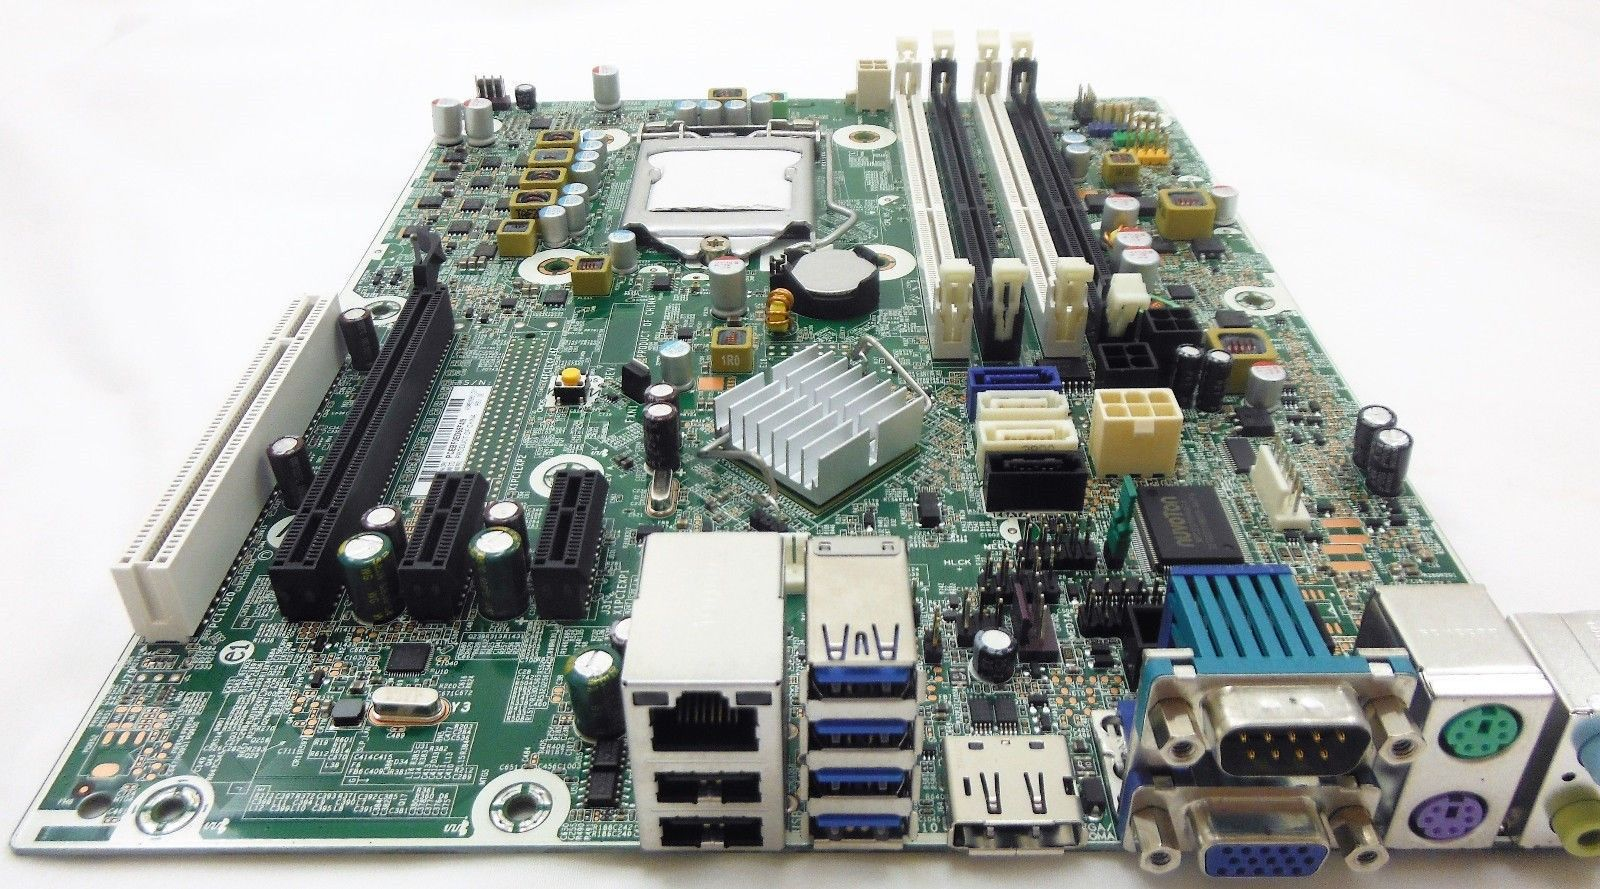 Genuine HP Compaq Pro 6300 SFF LGA775 Desktop Motherboard 656961-001  657239-001